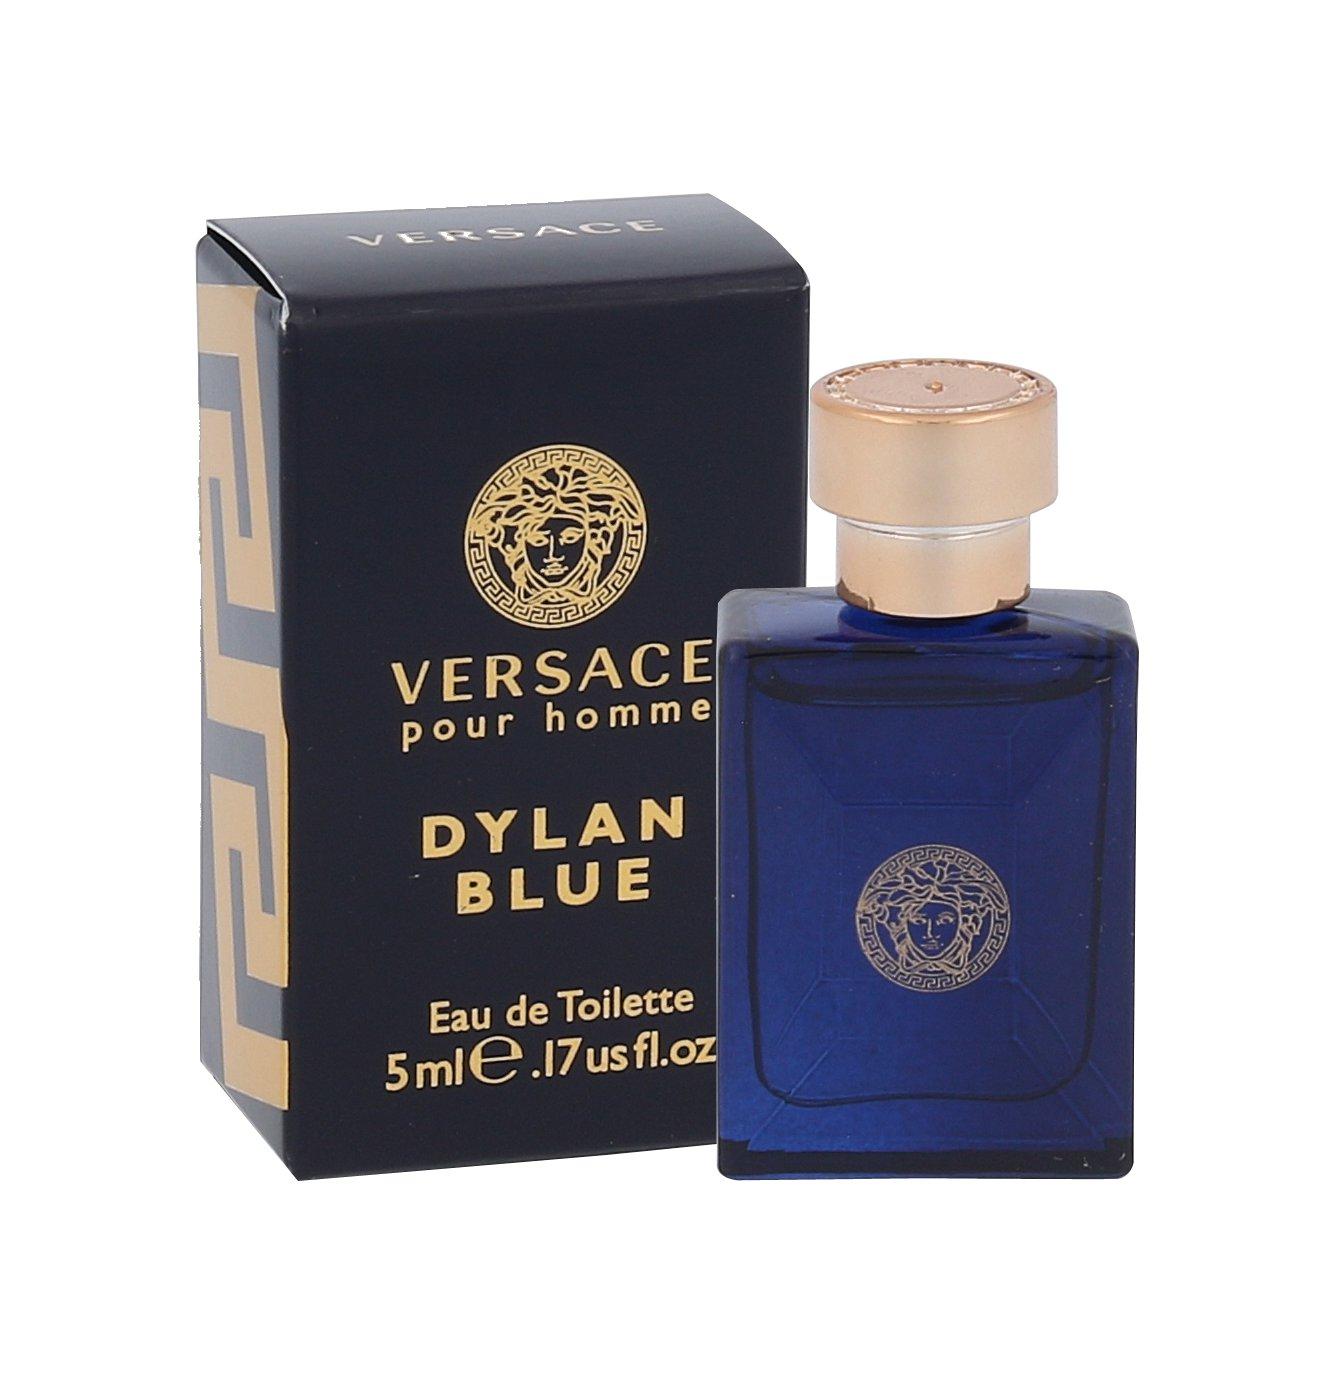 Versace Pour Homme Dylan Blue, Toaletná voda 5ml